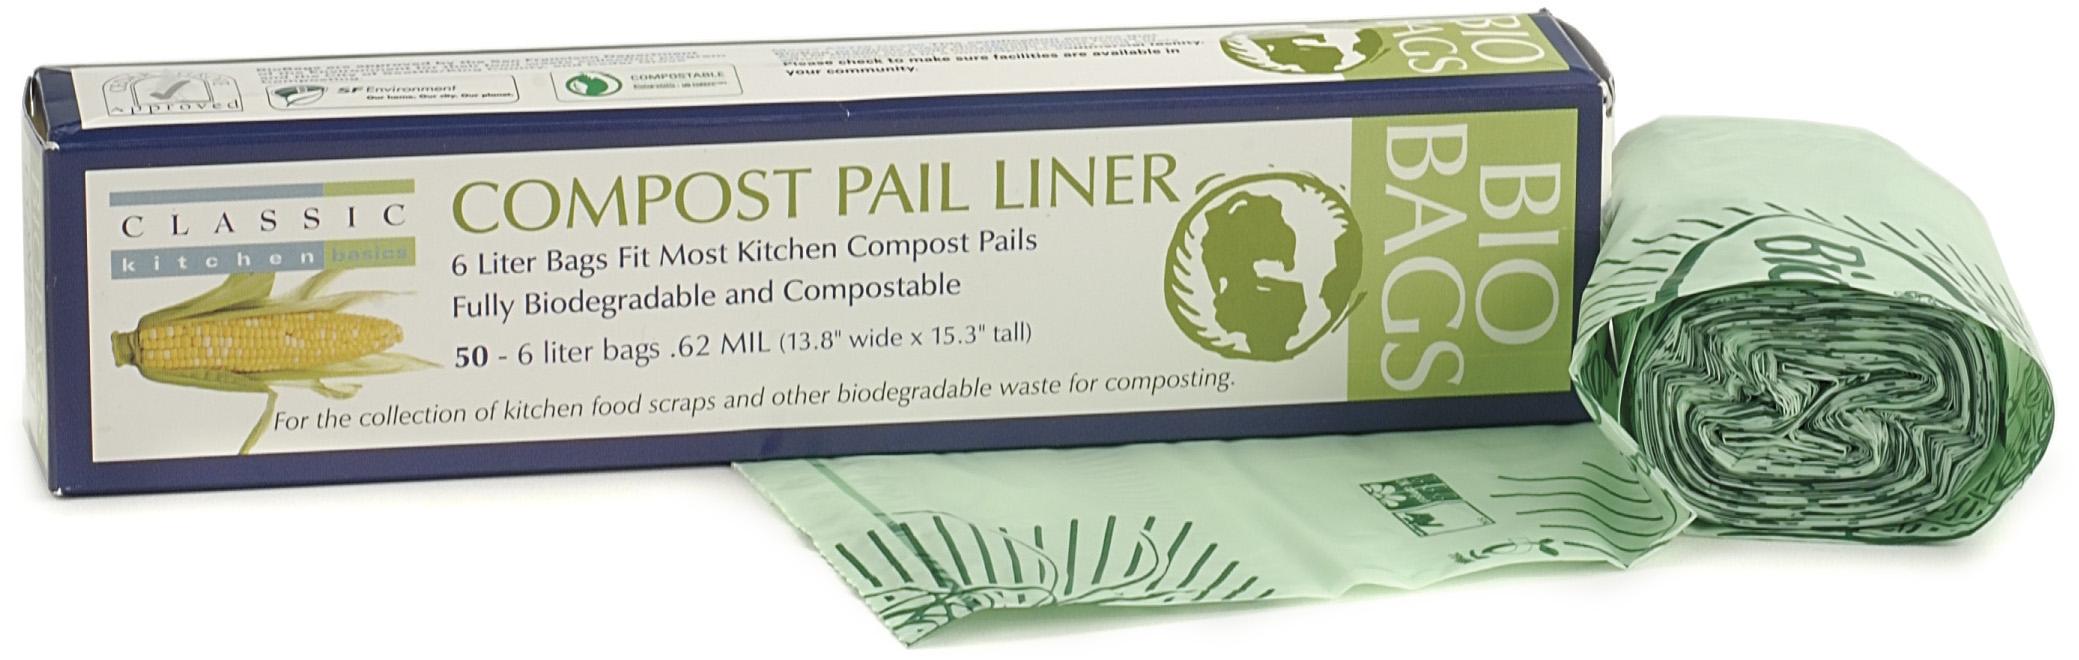 Biodegradable Plastic Compost Liner 6 Liter 50 Count